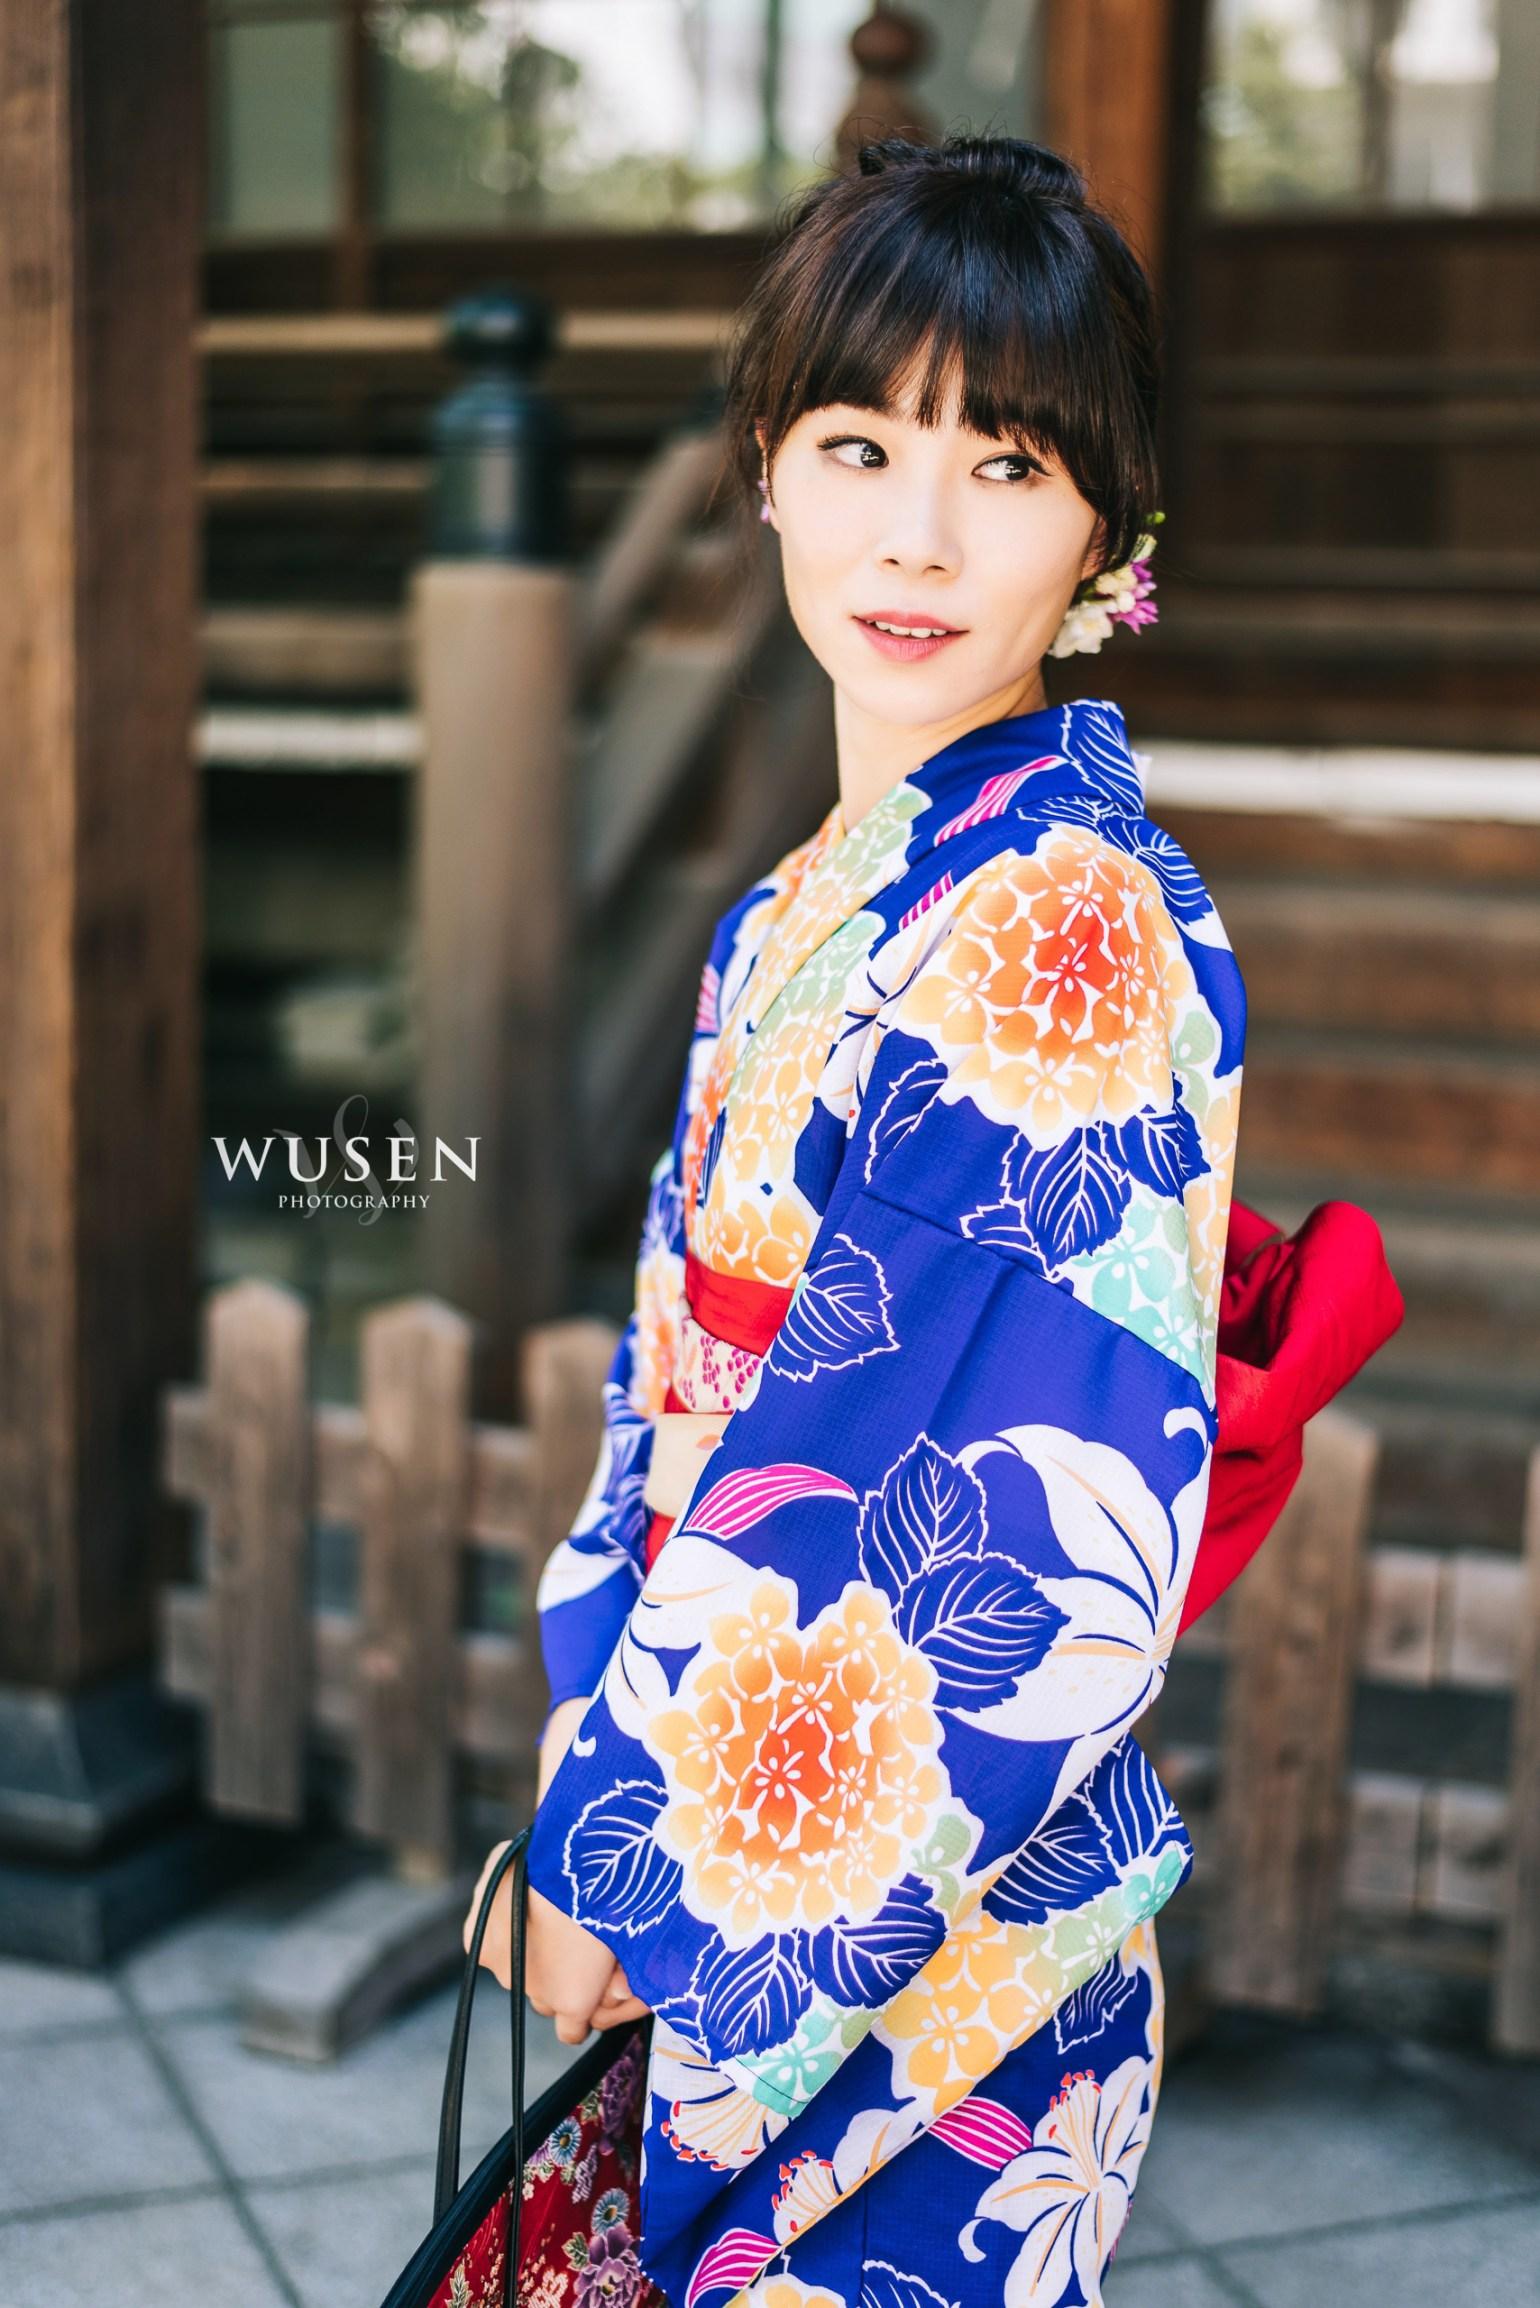 日本九州 福岡博多 和服攝影外拍 Fukuoka Kimono Photographer – 京都和服寫真 Wusen Photography